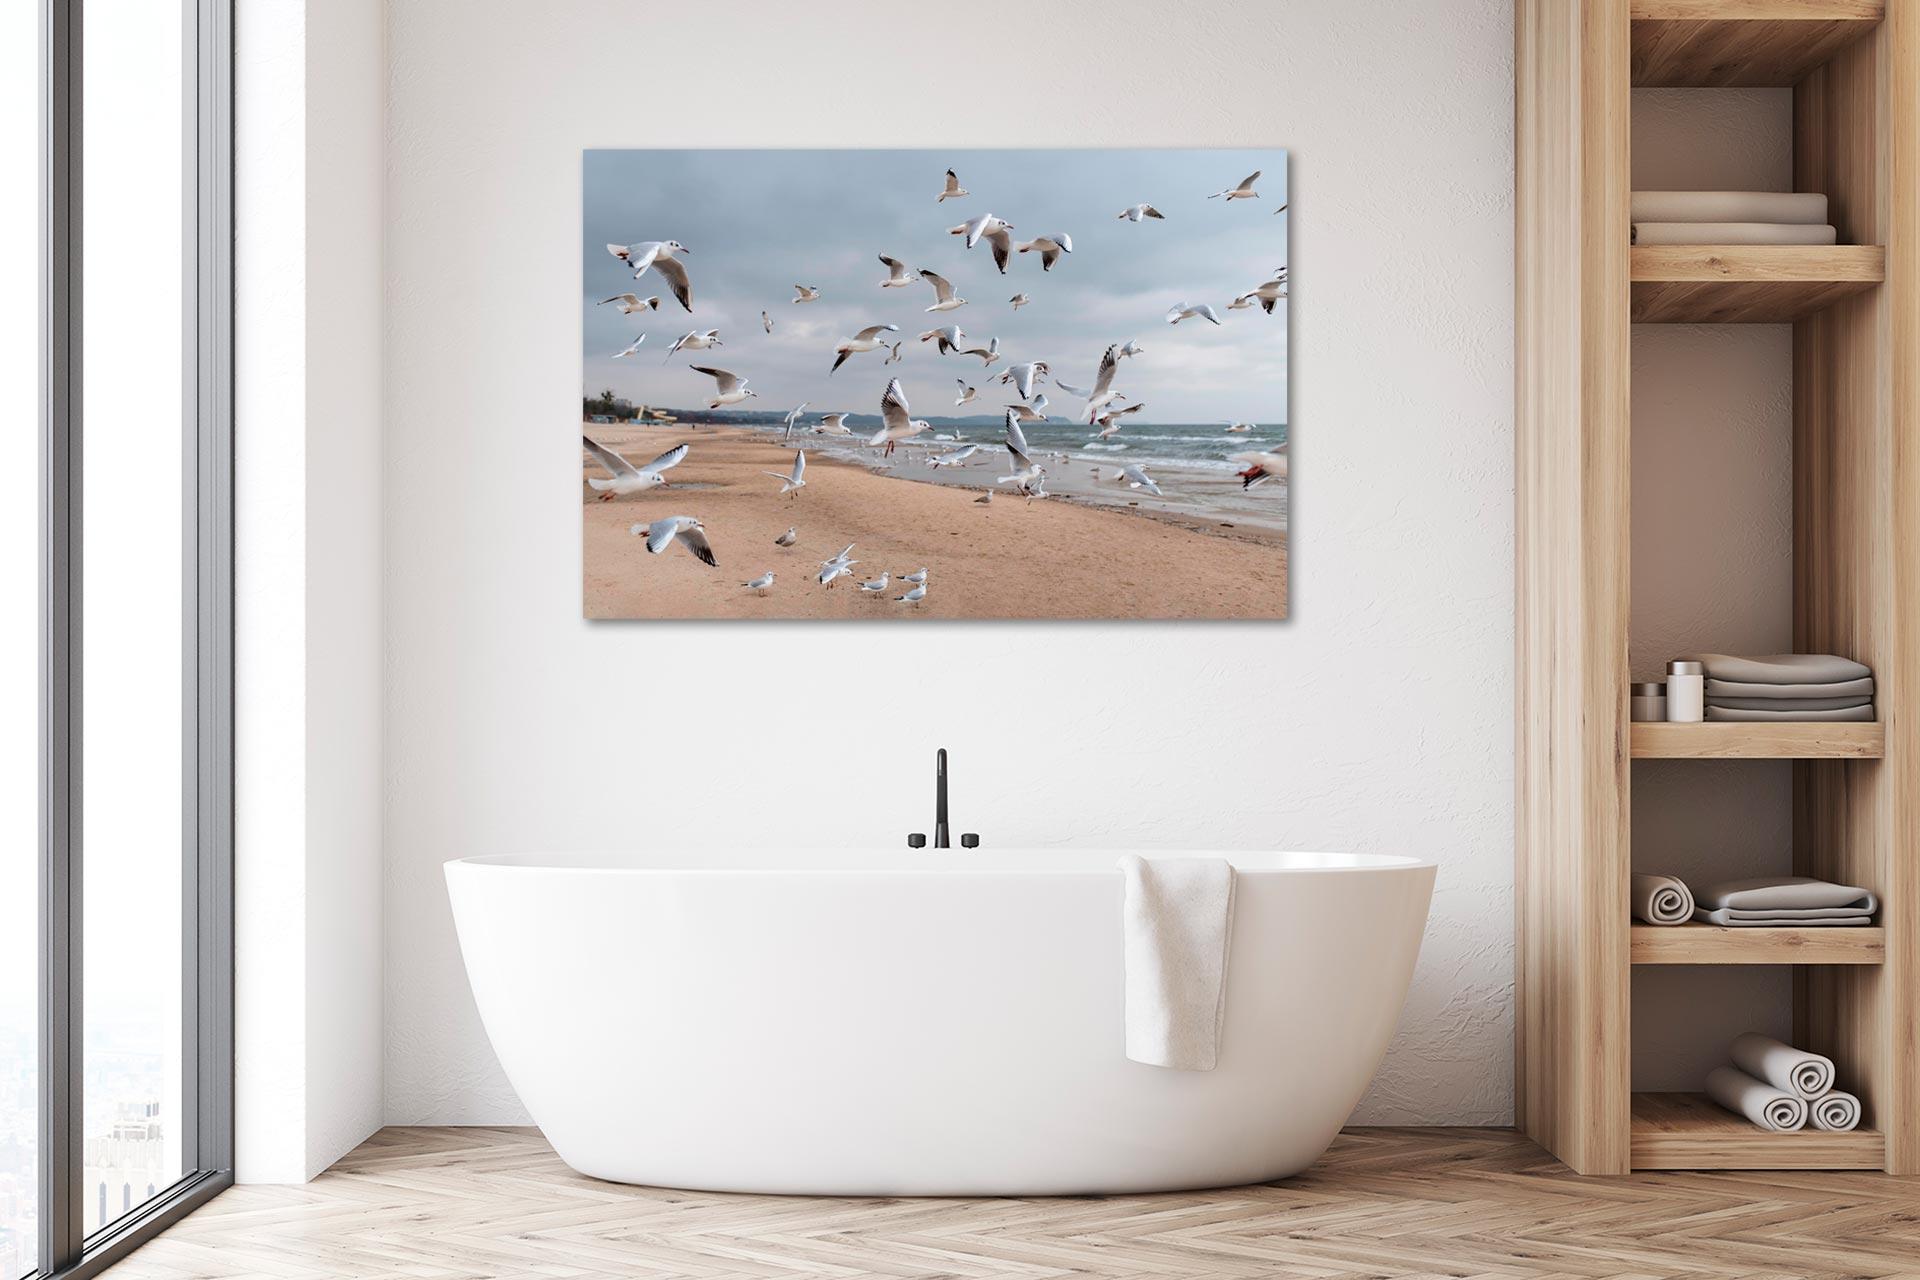 LCW490-mewa-moewe-ostsee-wandbild-leinwand-acrylglas-aludibond-bad